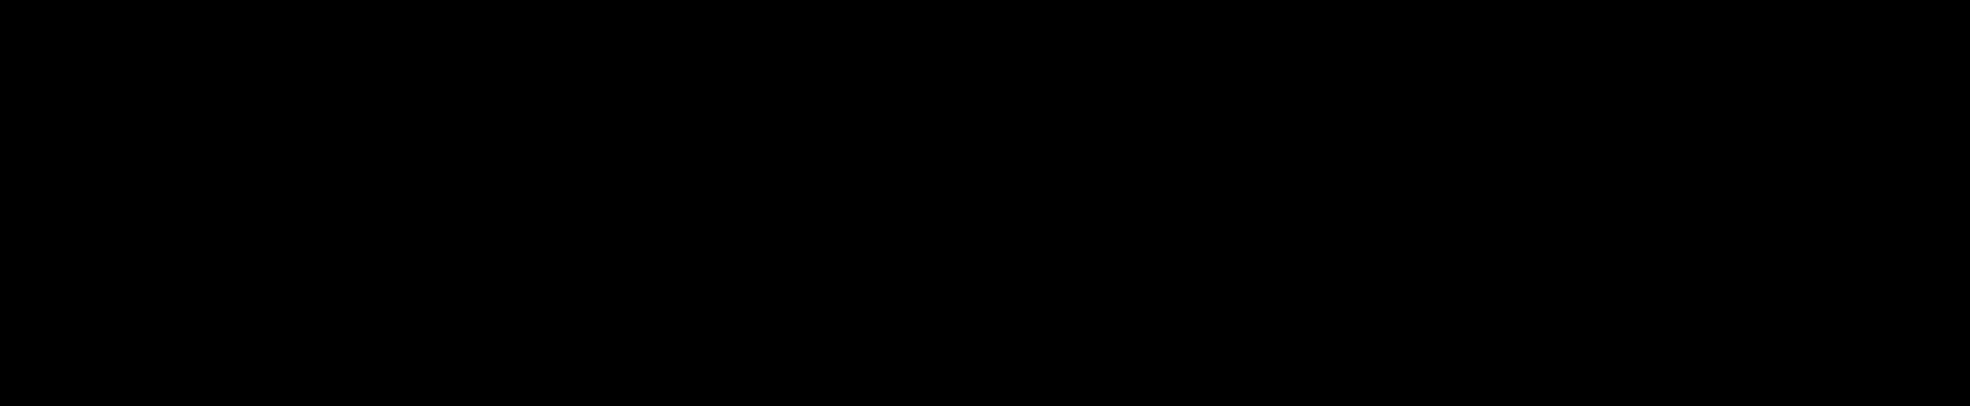 Gun Gale Online - GGO Title Logo Font